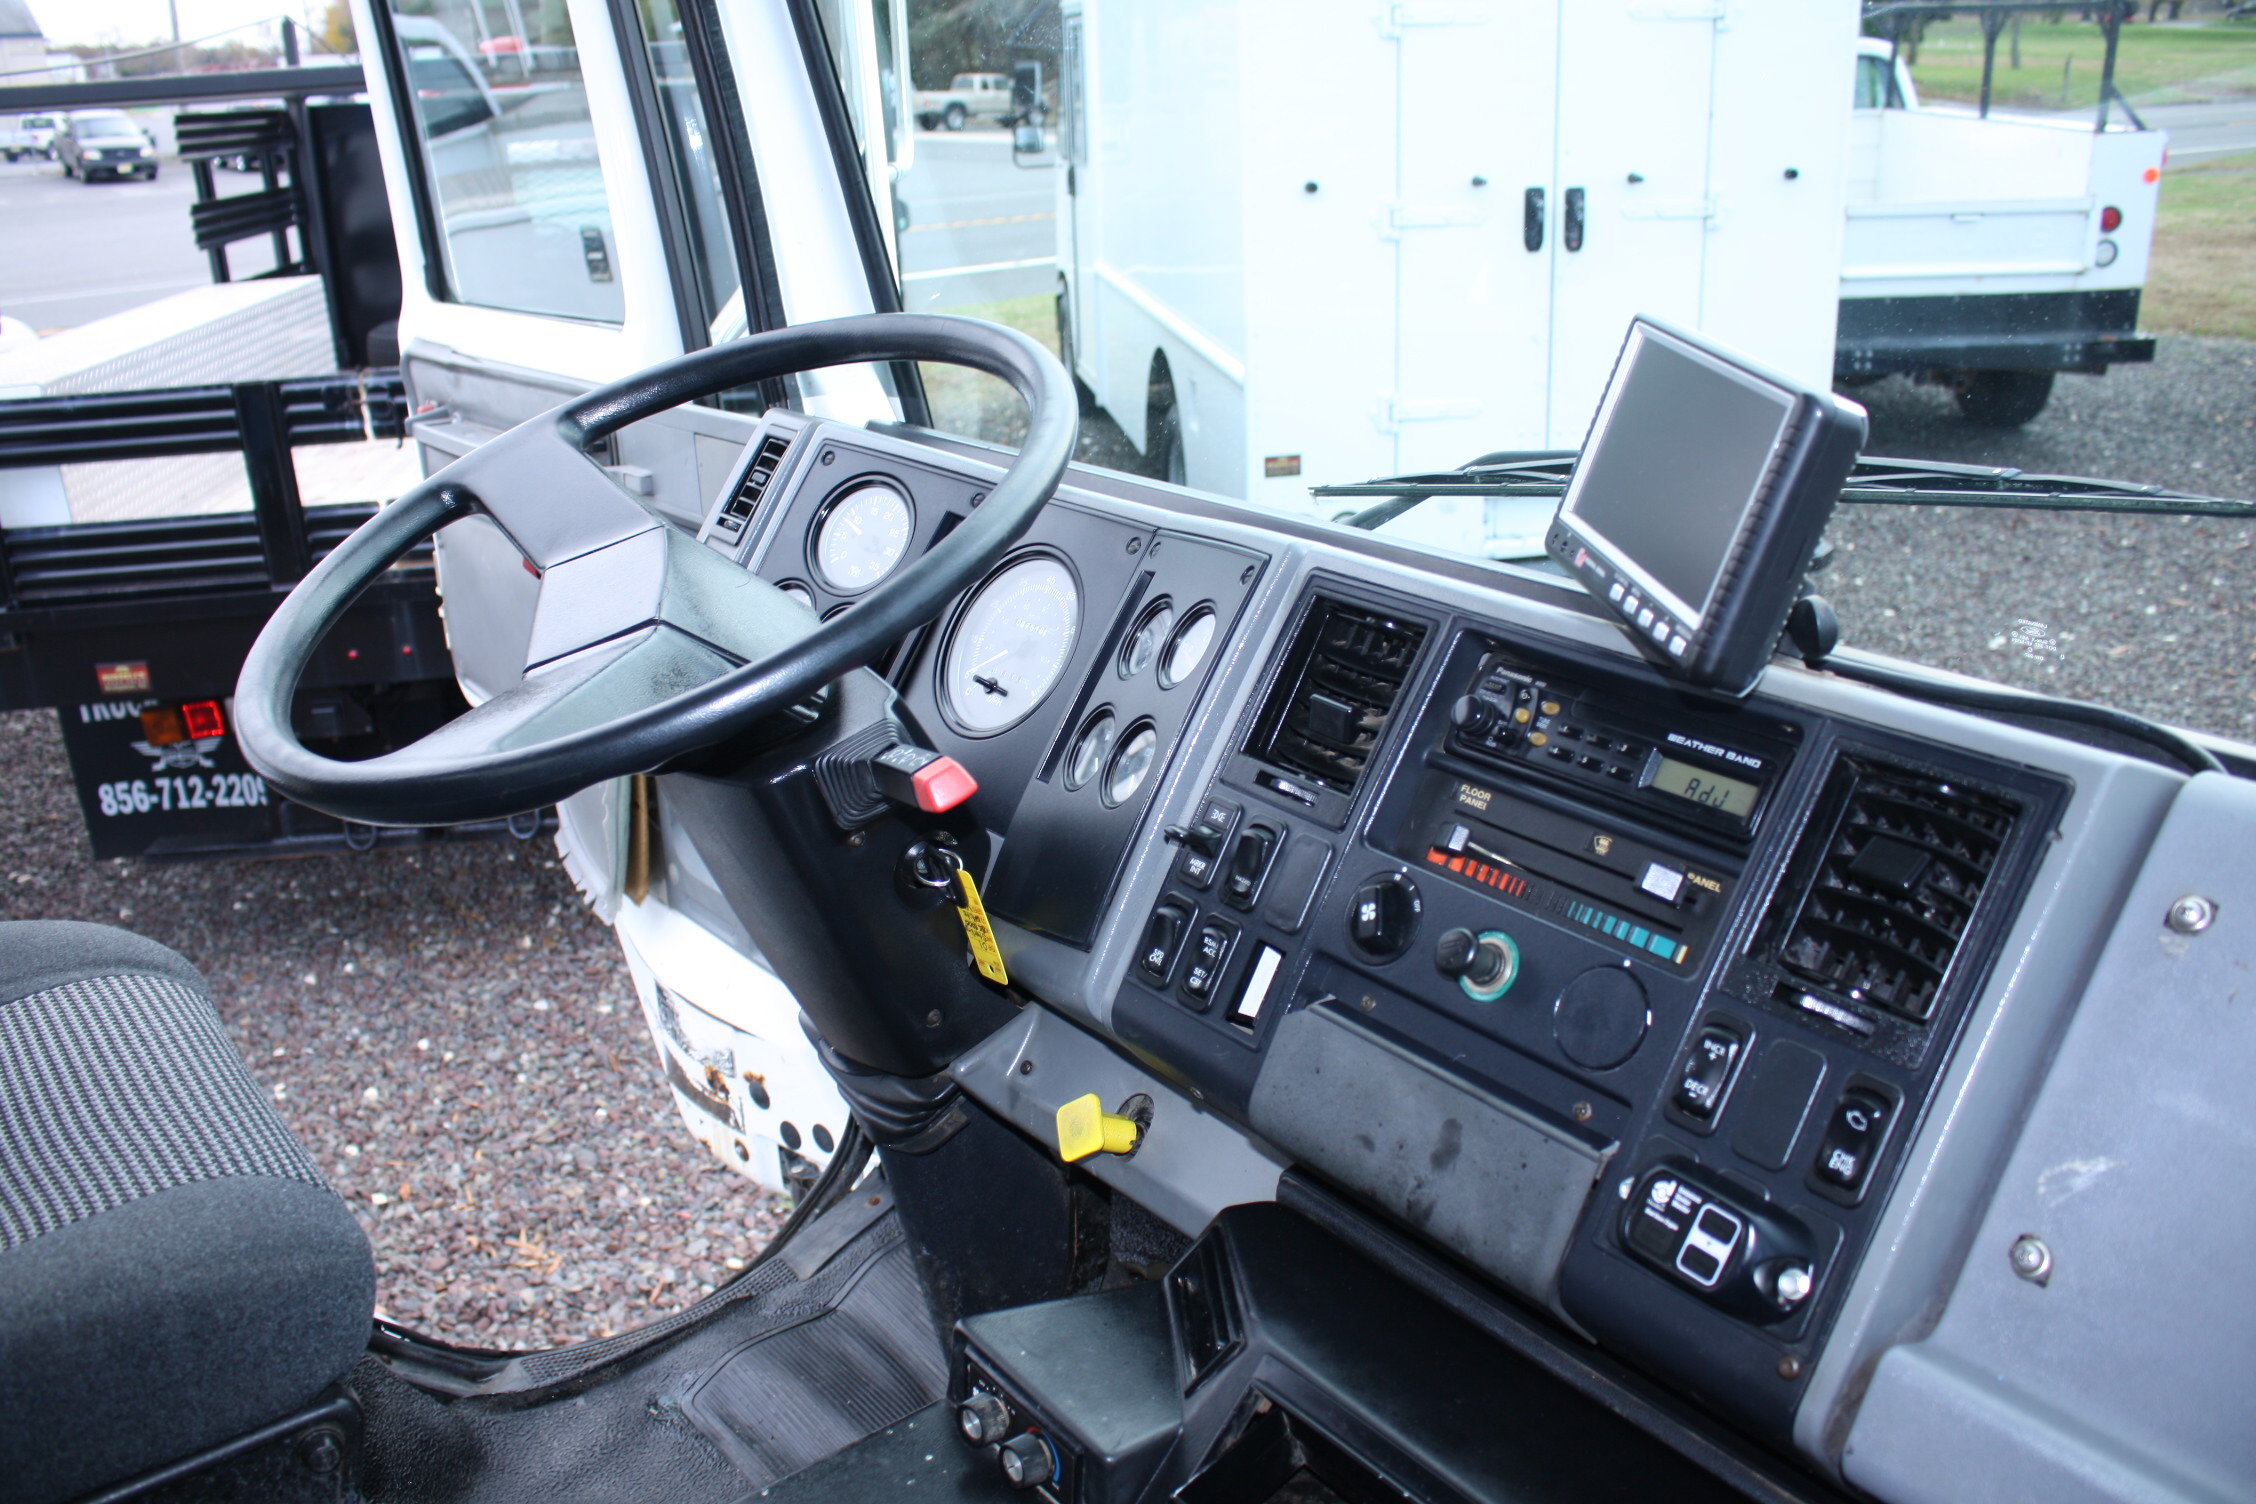 IMG 2319 - 2001 STERLING SC8000 LEAF VAC TRUCK